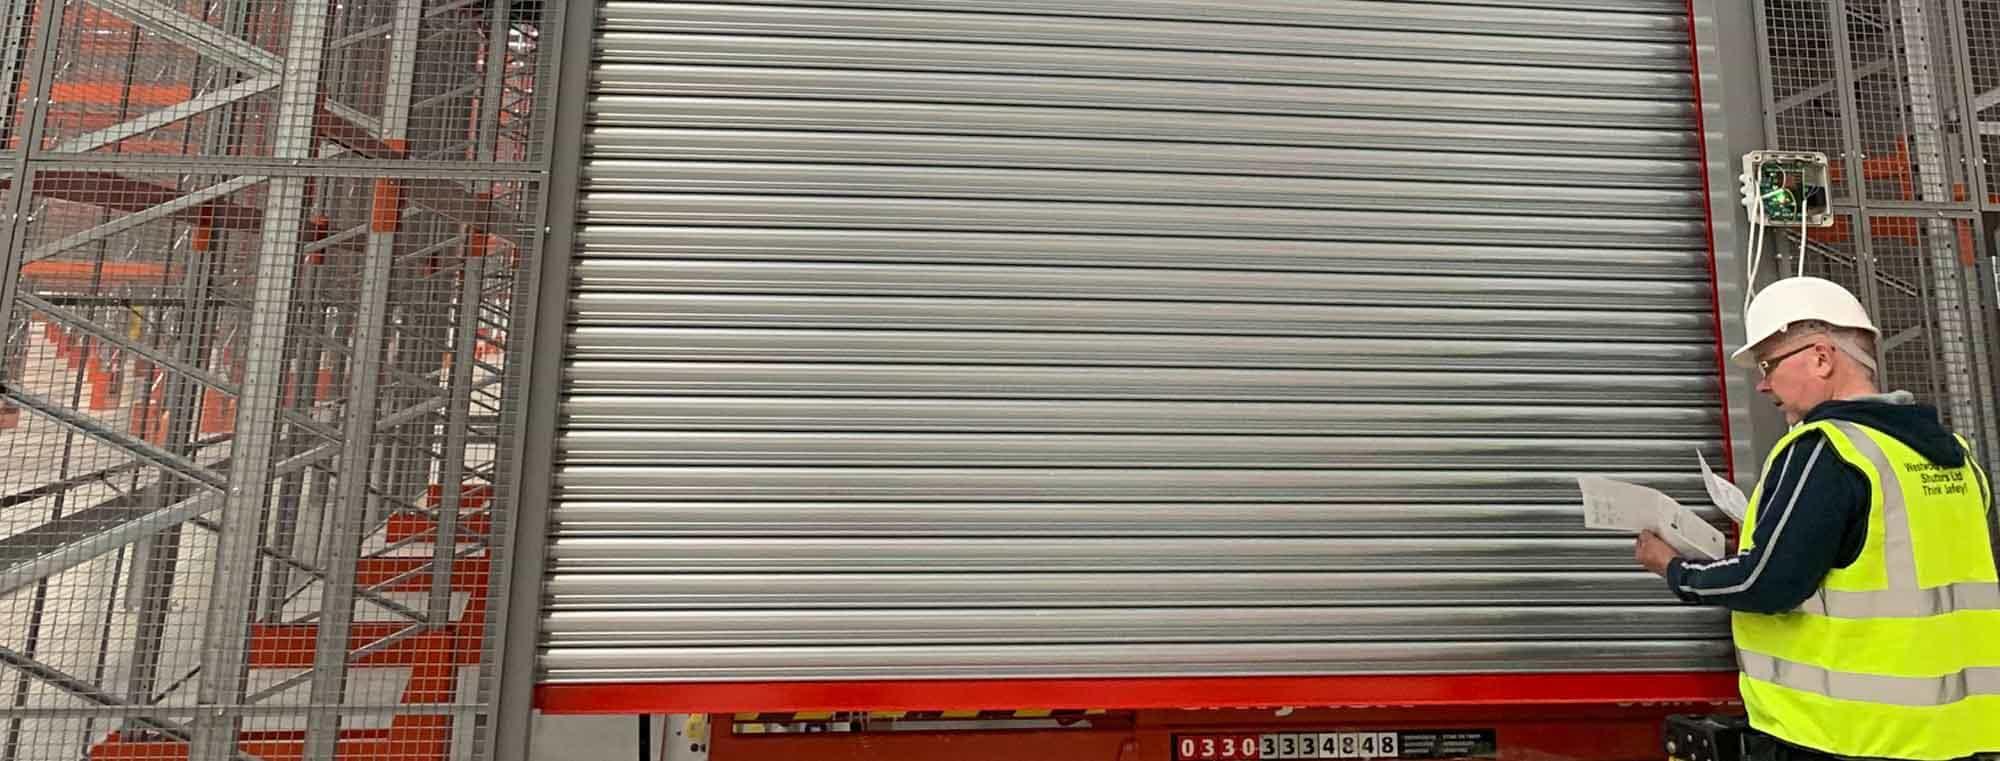 Westwood Security Shutters Ltd Roller Shutter Fire